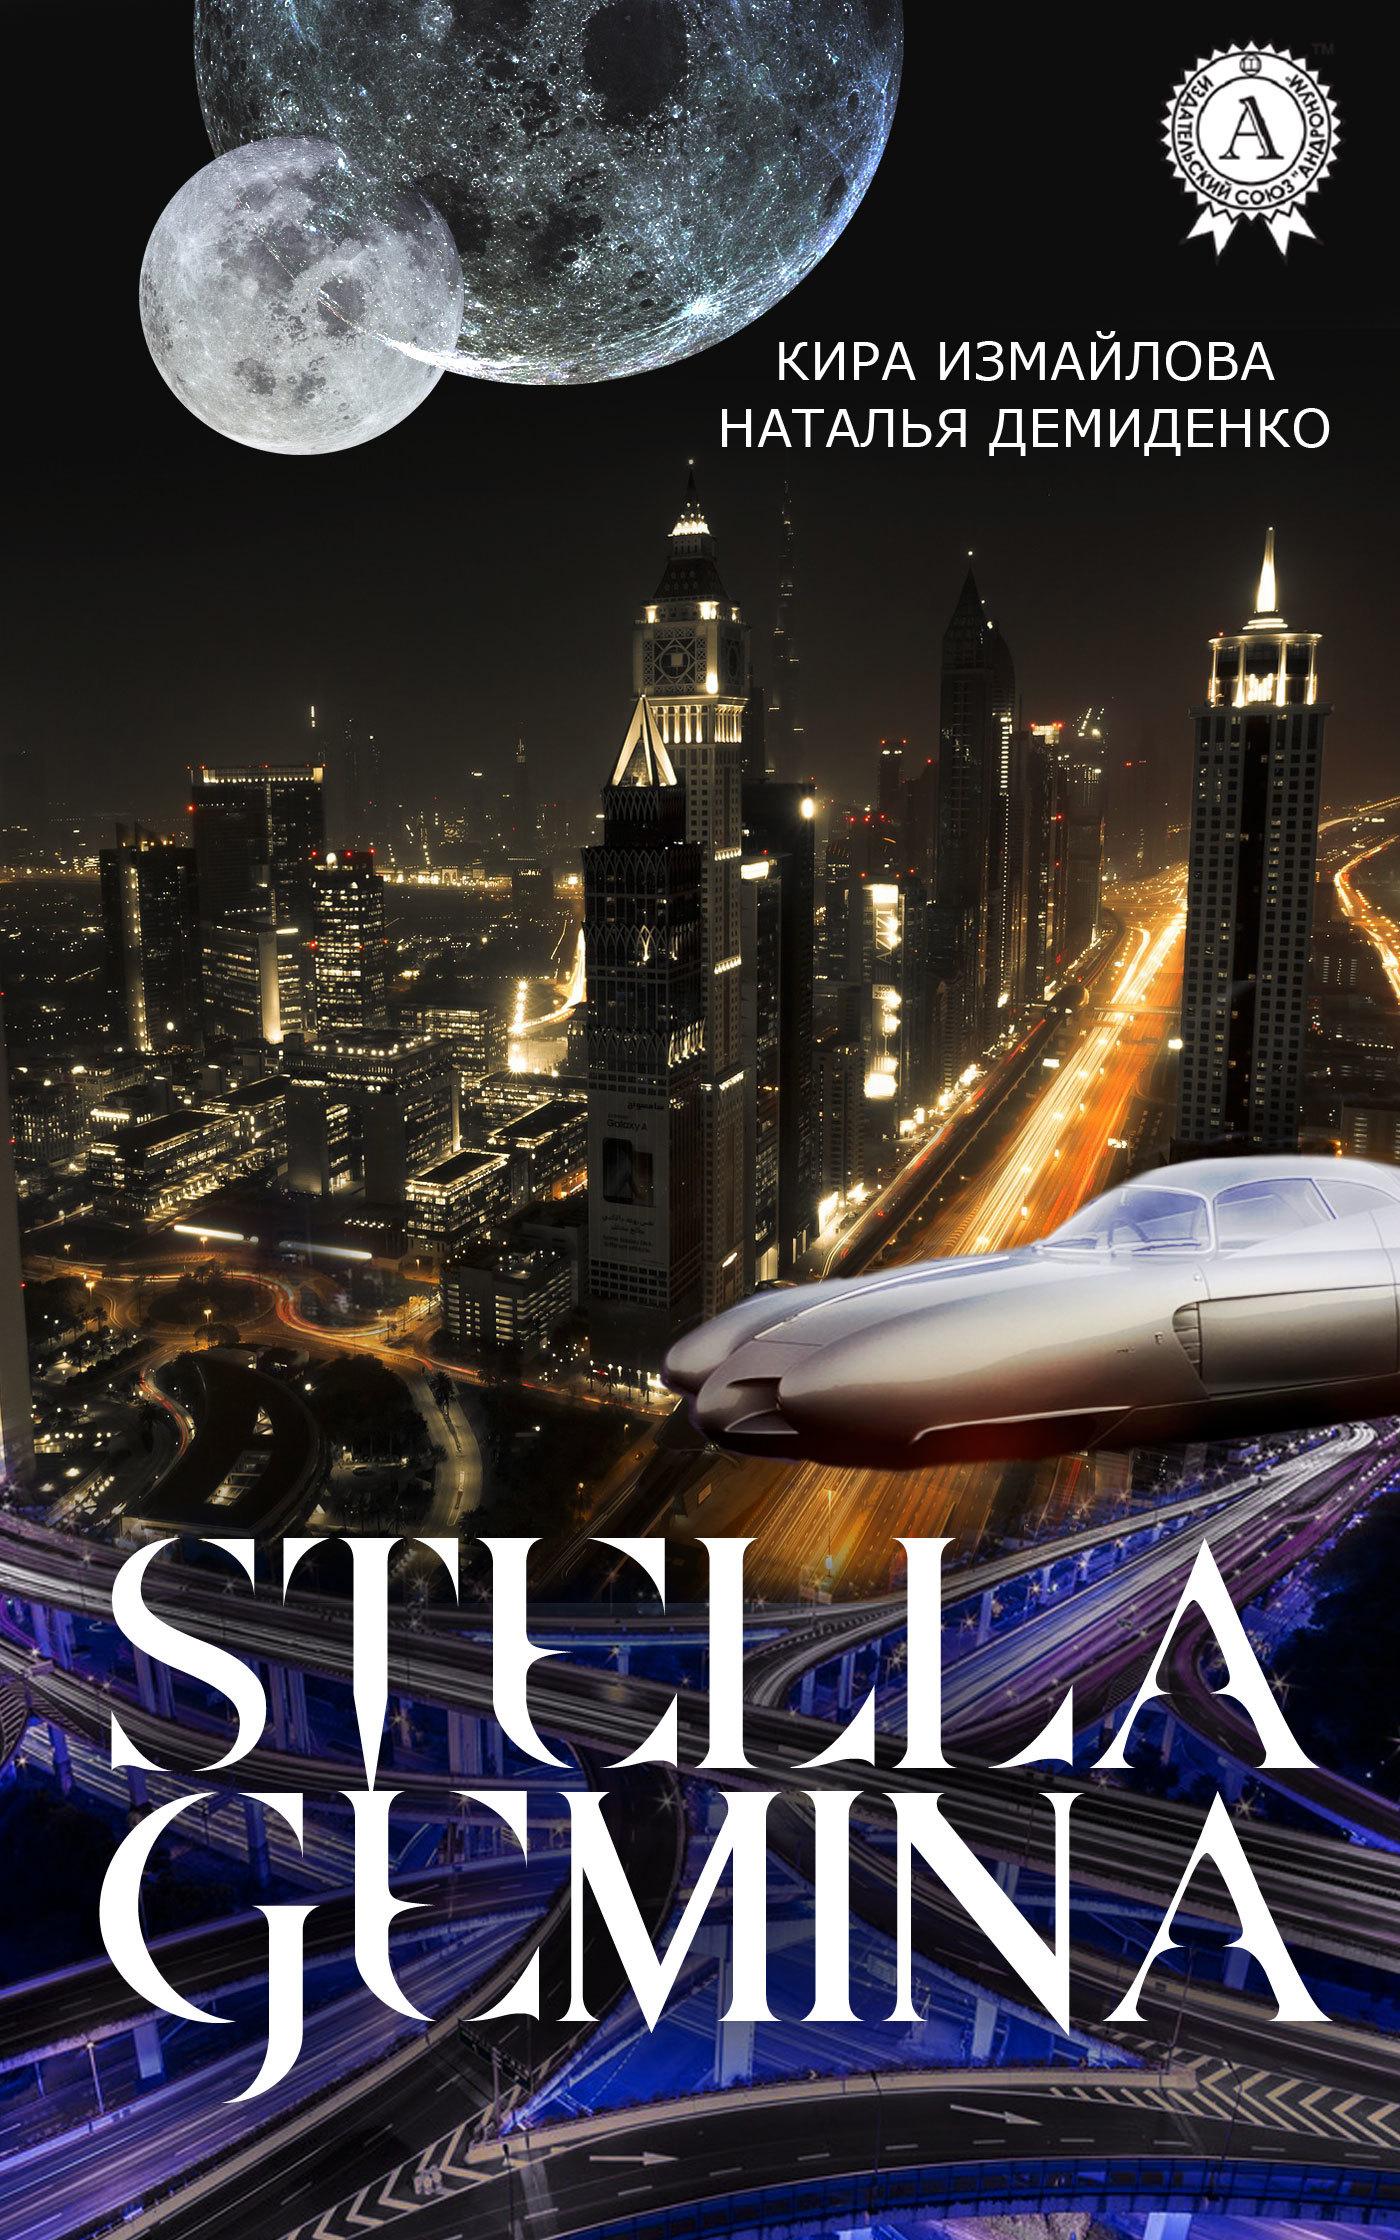 Кира Измайлова, Наталья Демиденко - Stella Gemina